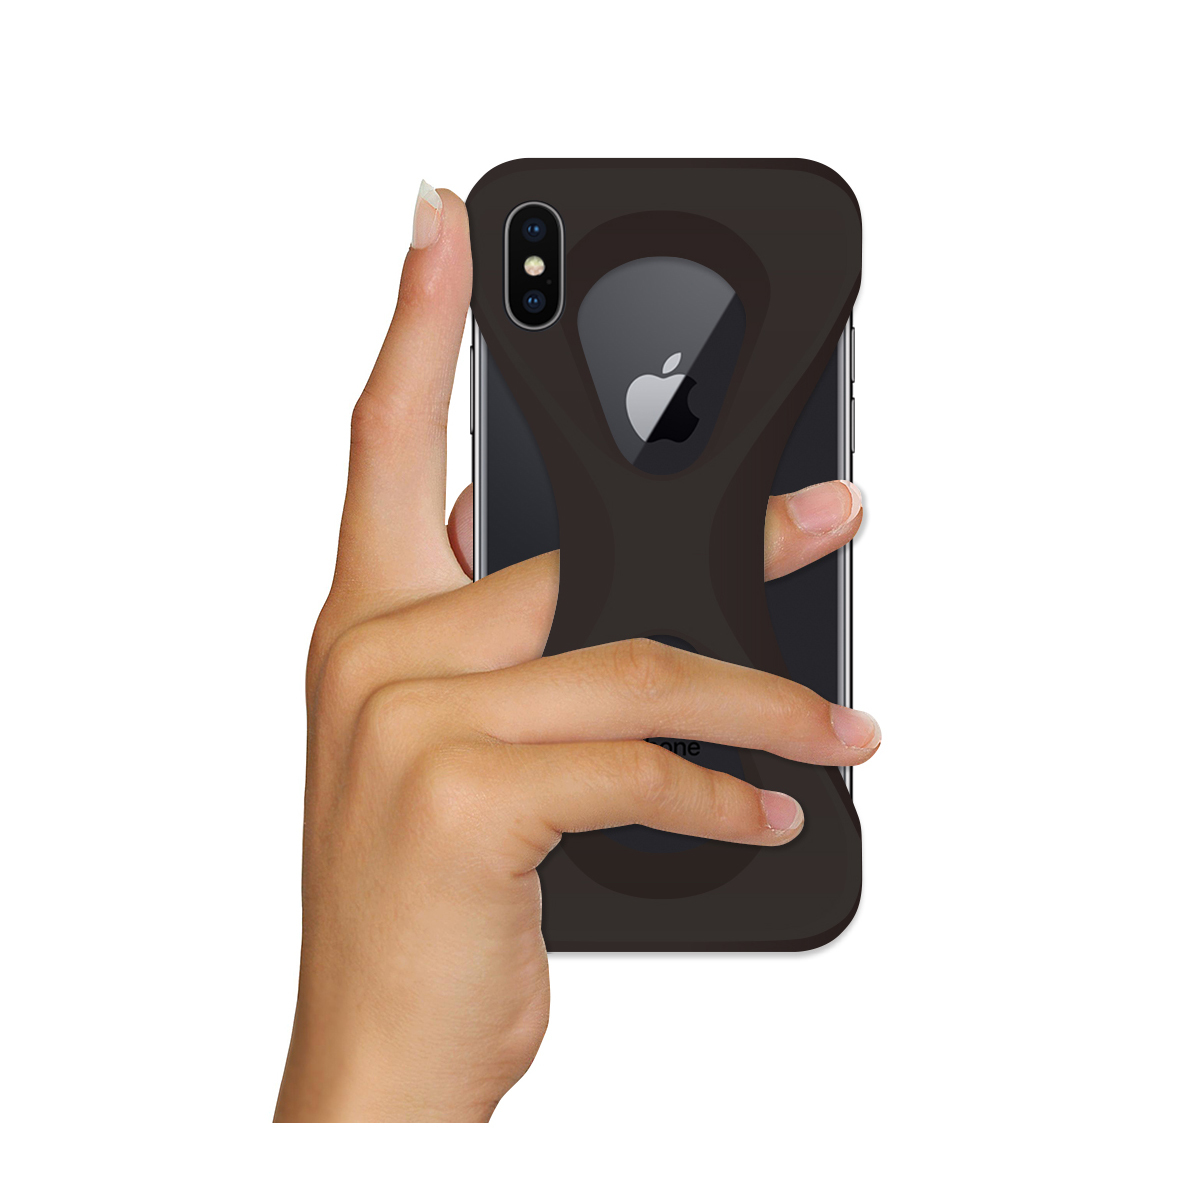 "iPhoneは、""指1本""で落とさない|iPhoneX / XS用 | 落とす不安から解放され、操作の自由度が広がる iPhone カバー"